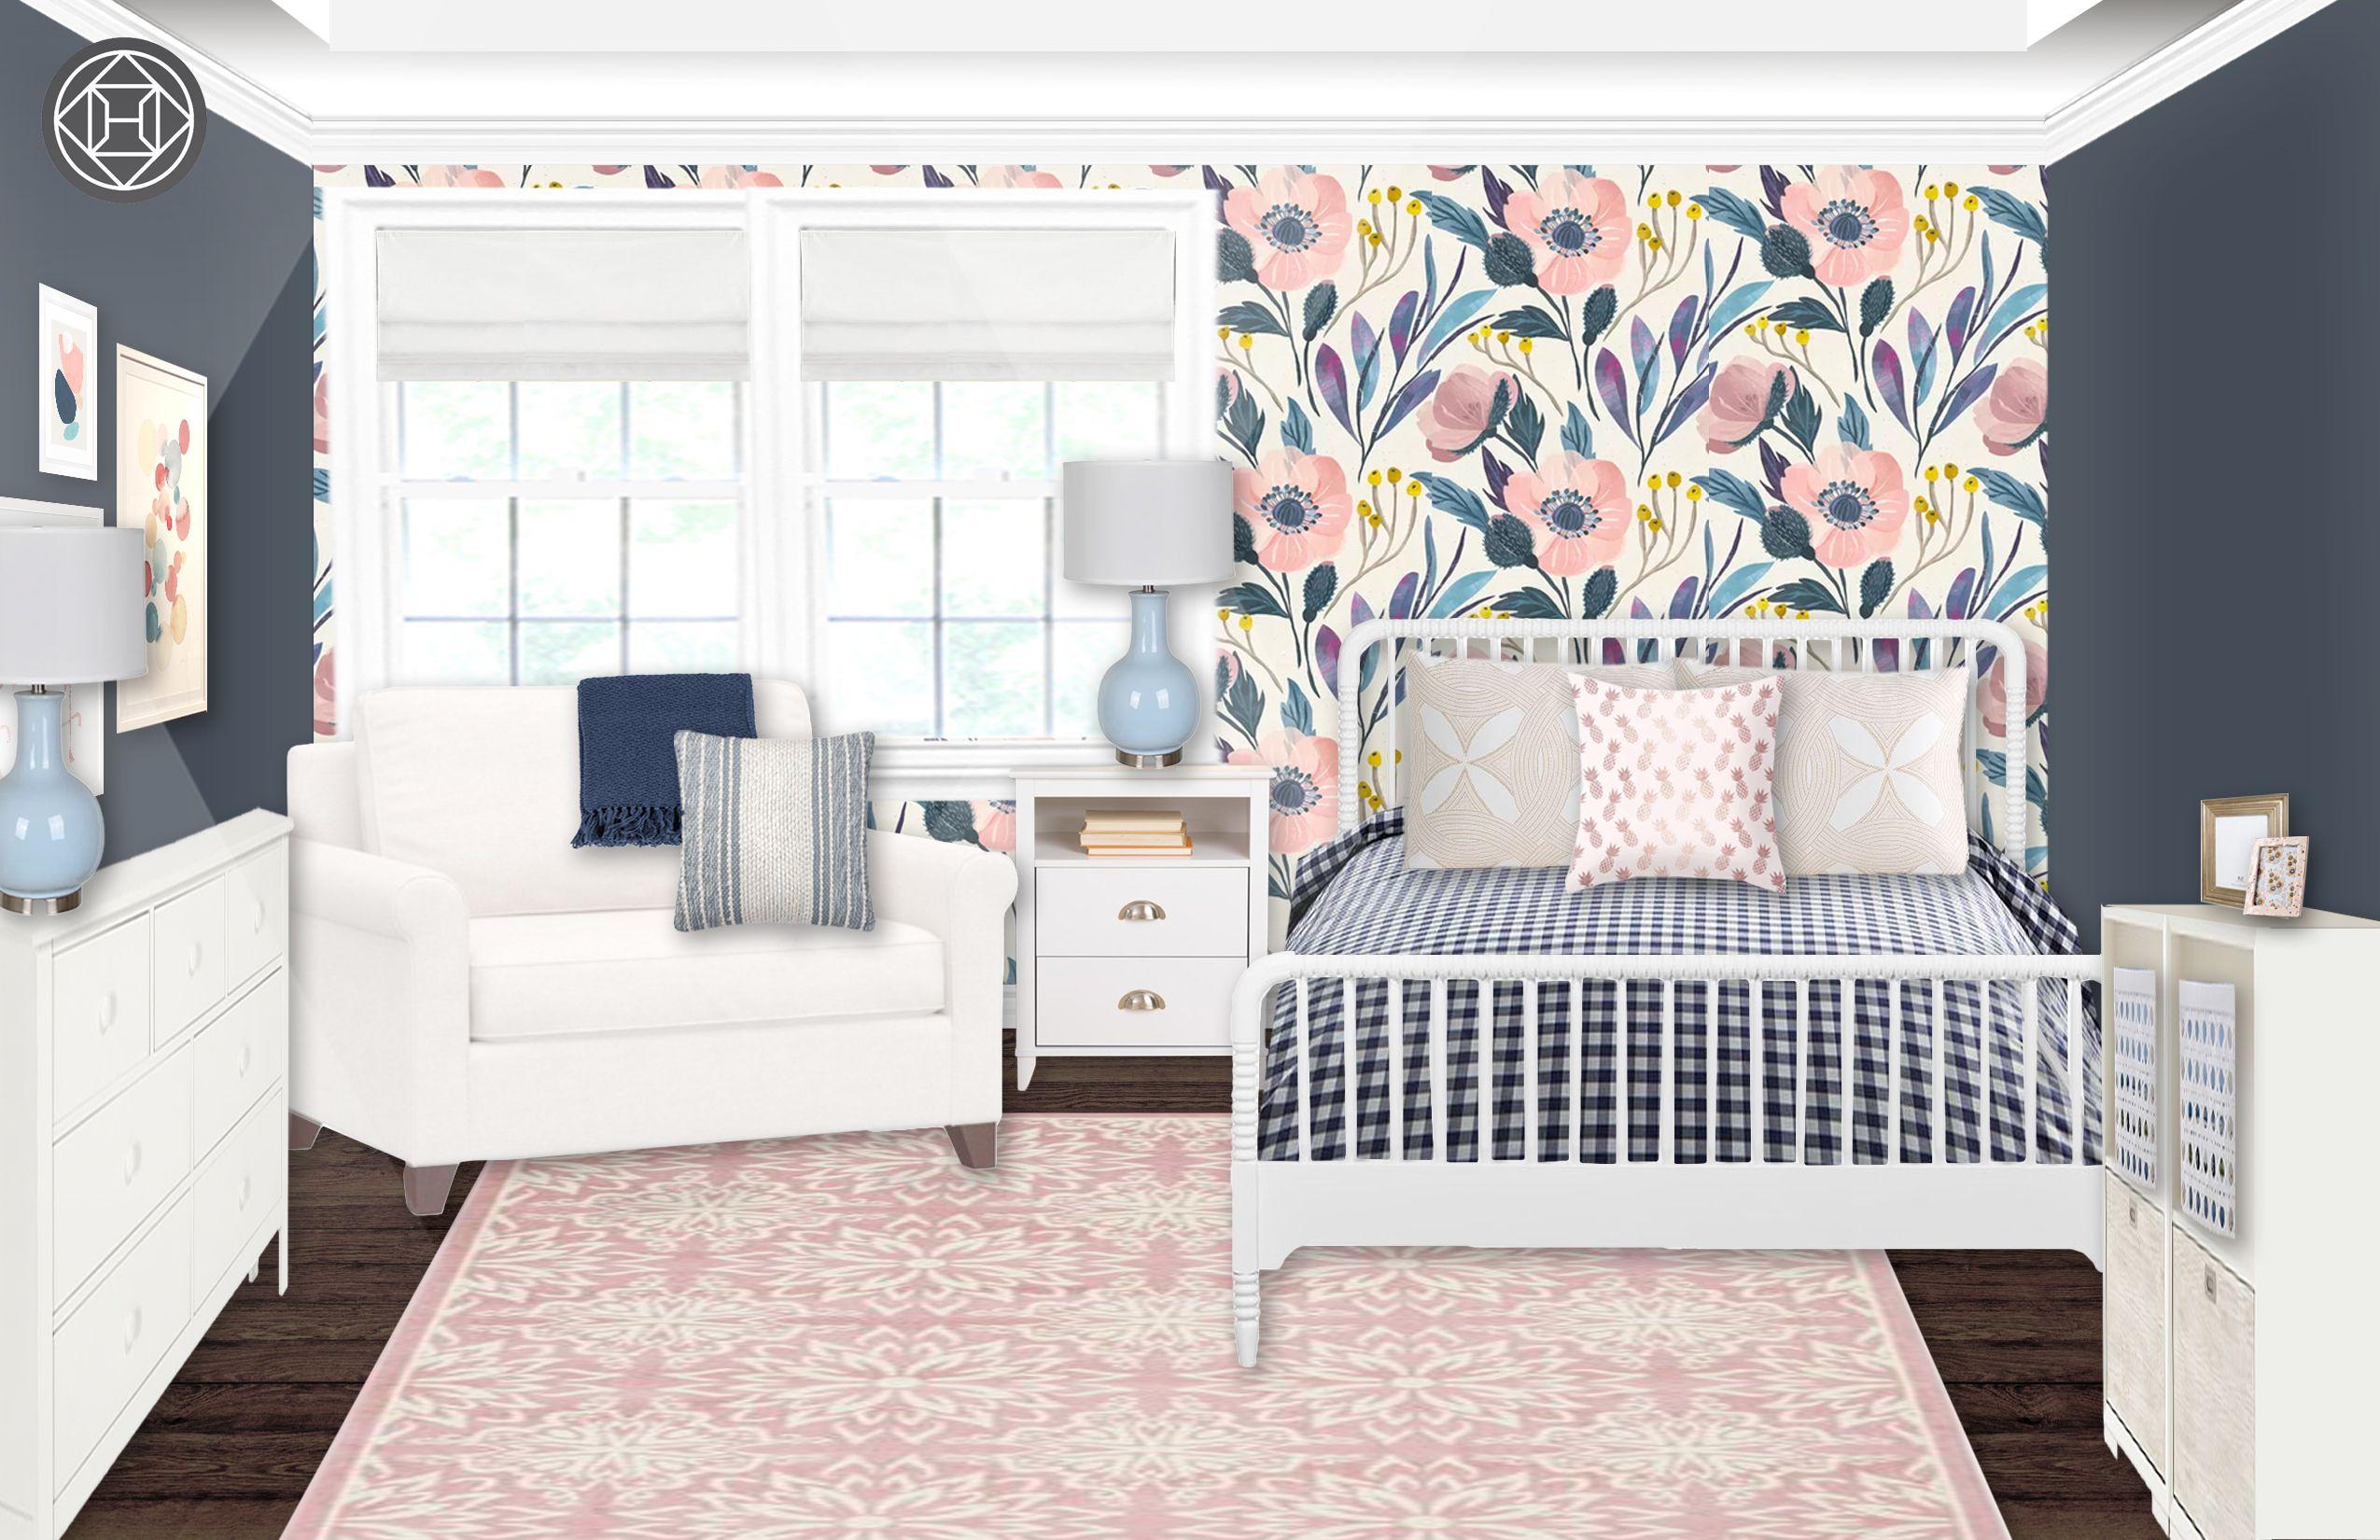 Eclectic Preppy Bedroom Design By Havenly Interior Designer Erin